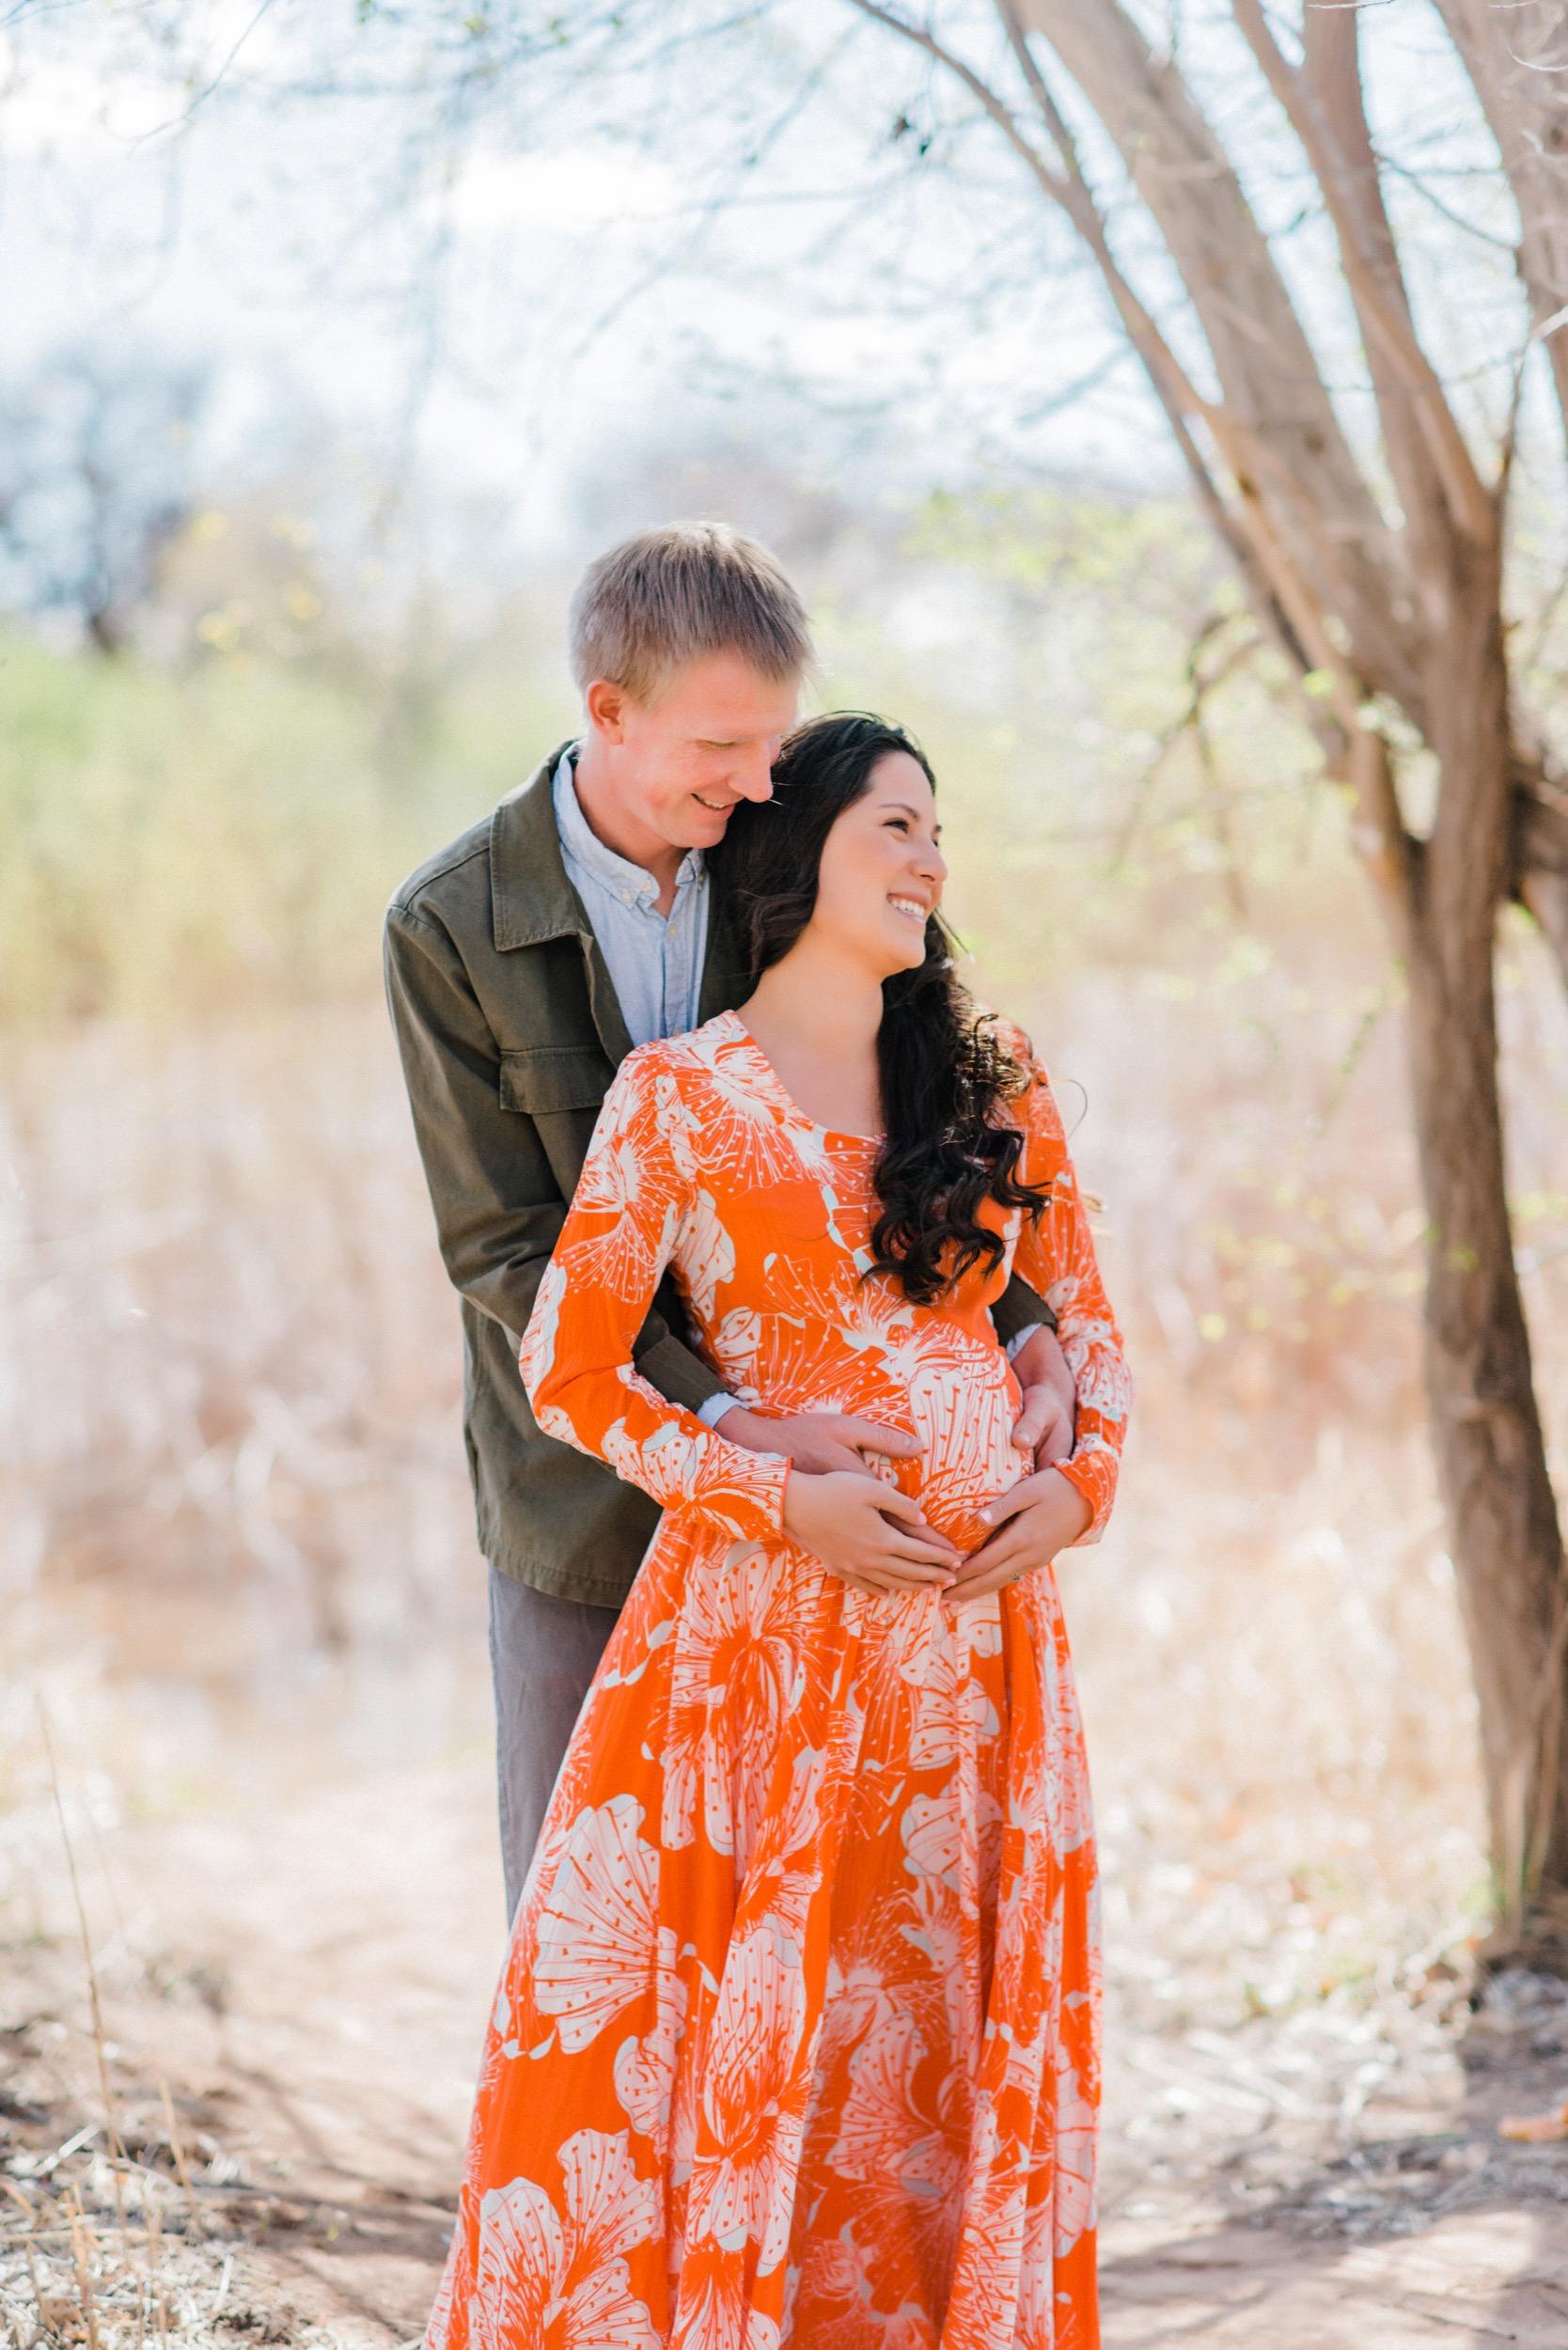 Carissa and Ben-maternity-southwest photographer-destination photographer-new mexico wedding-1001.1.jpg